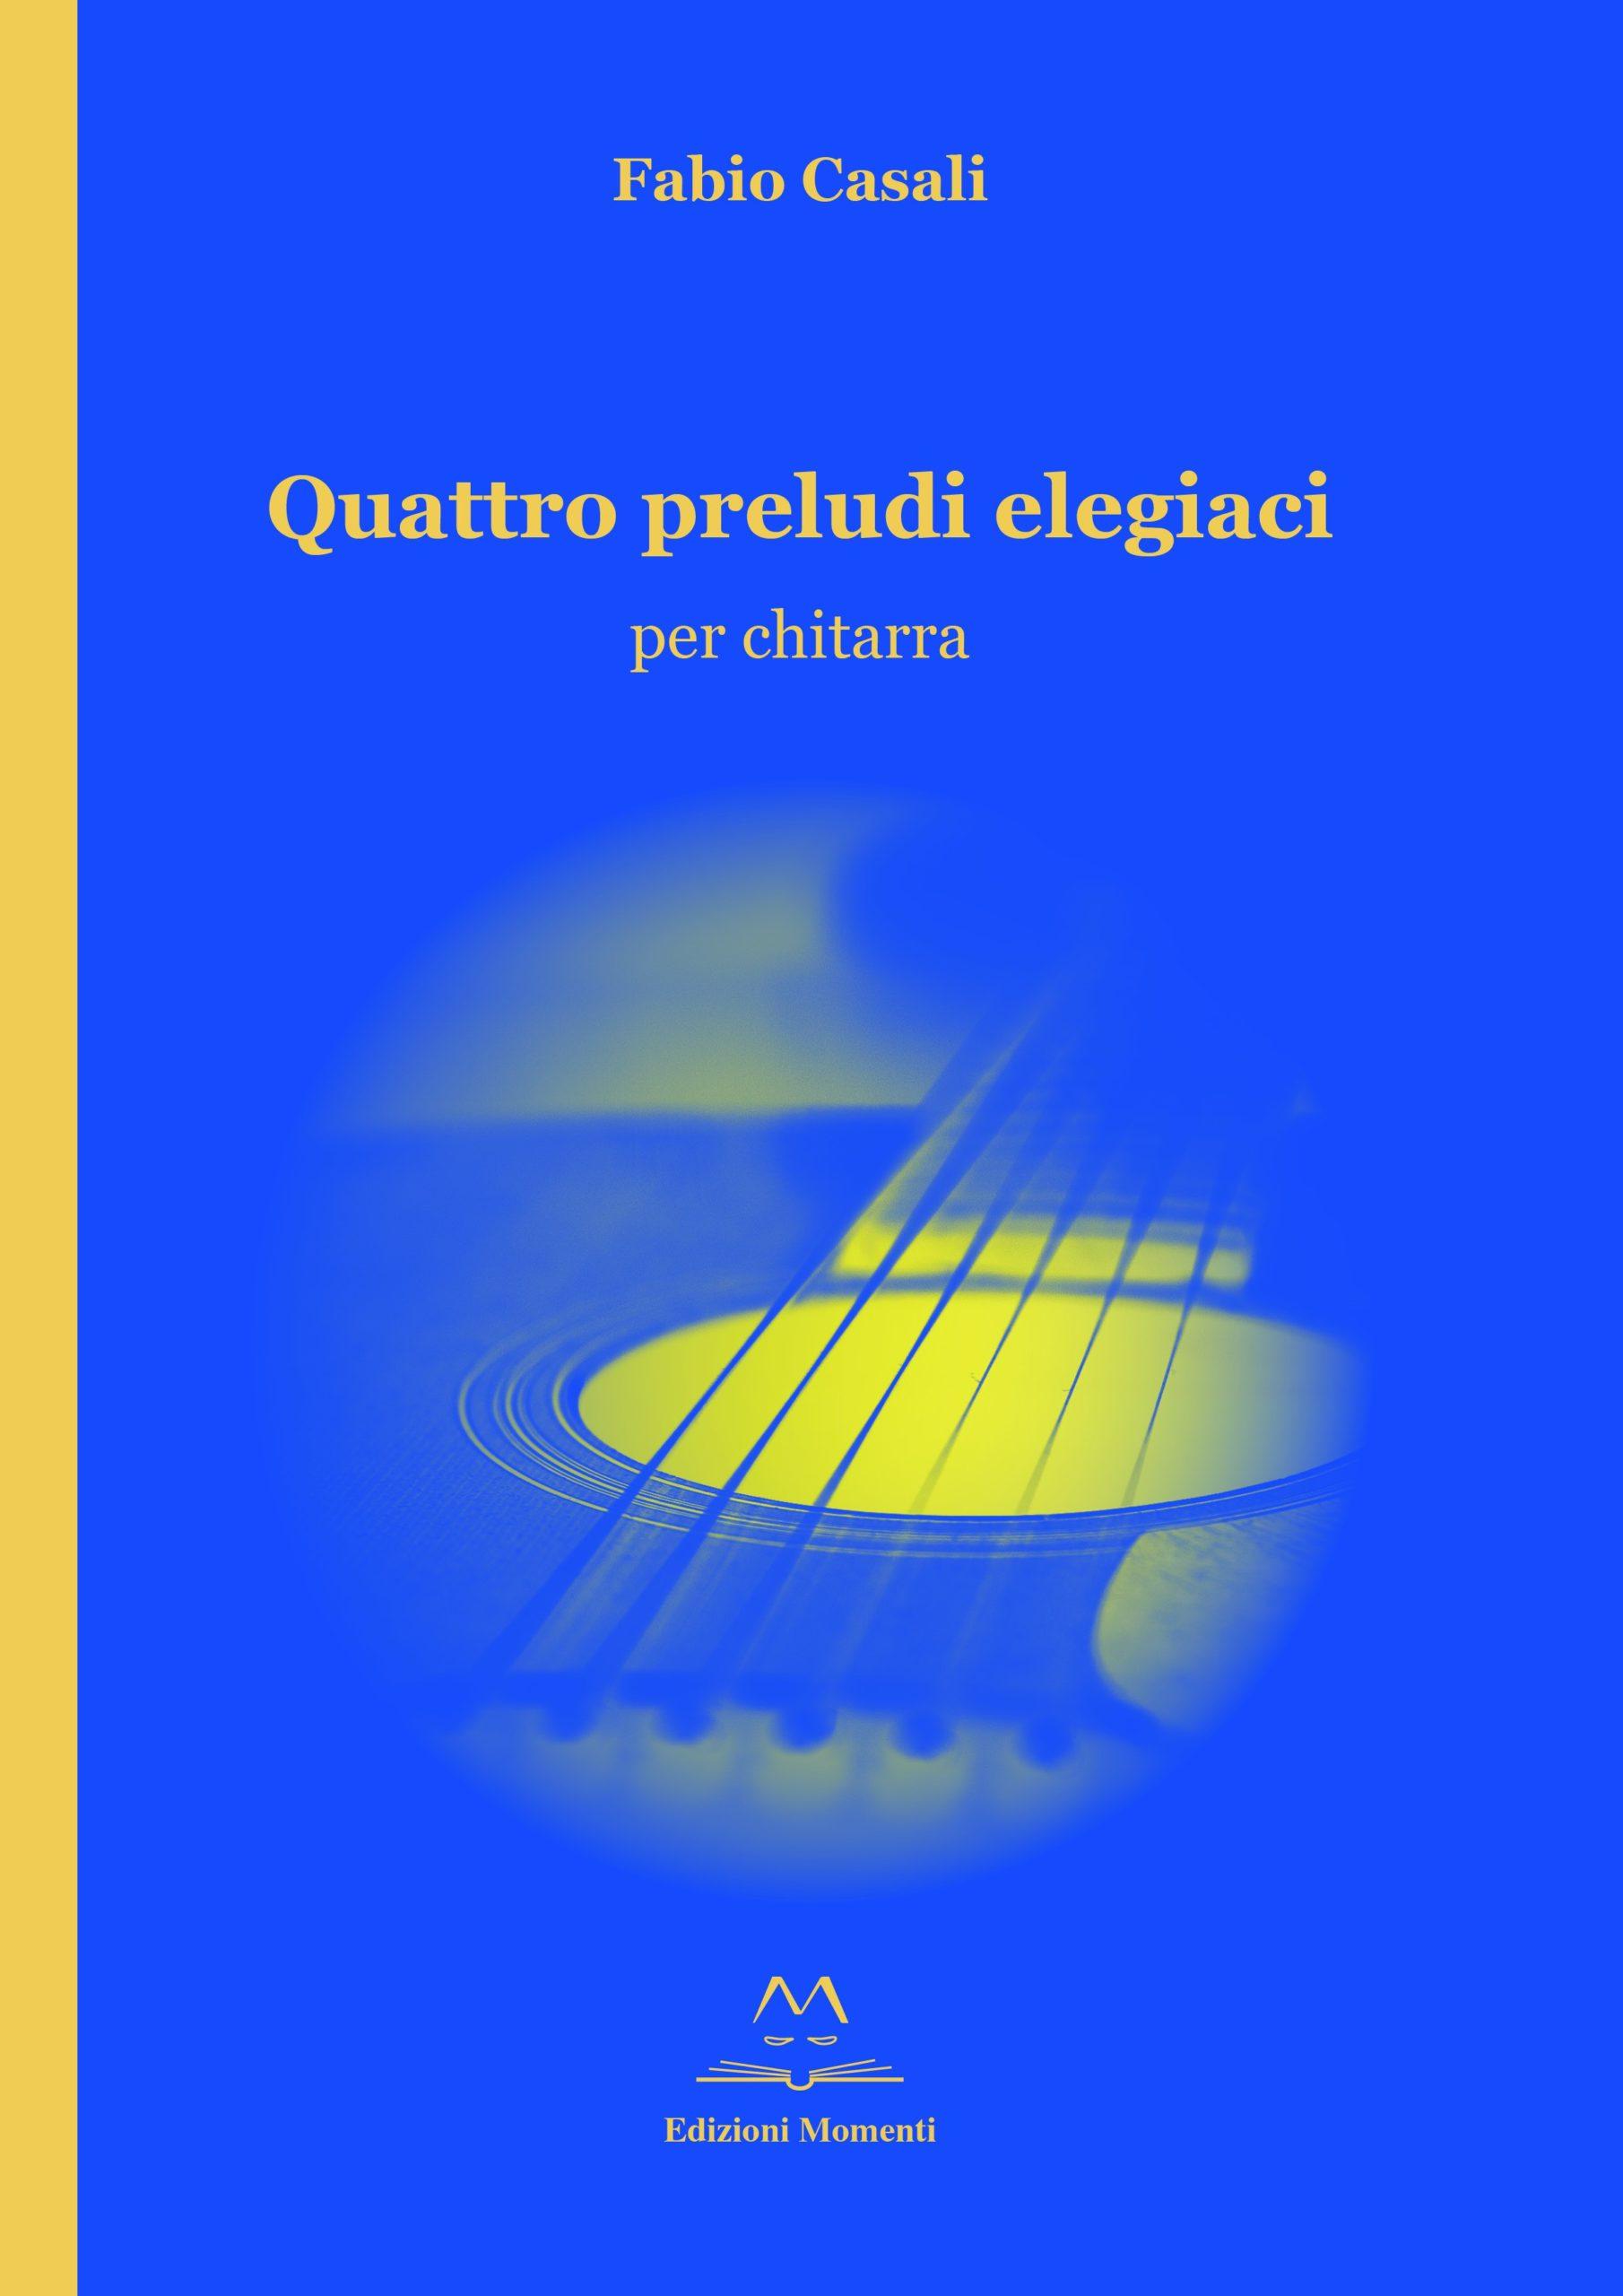 Quattro preludi elegiaci di Fabio Casali